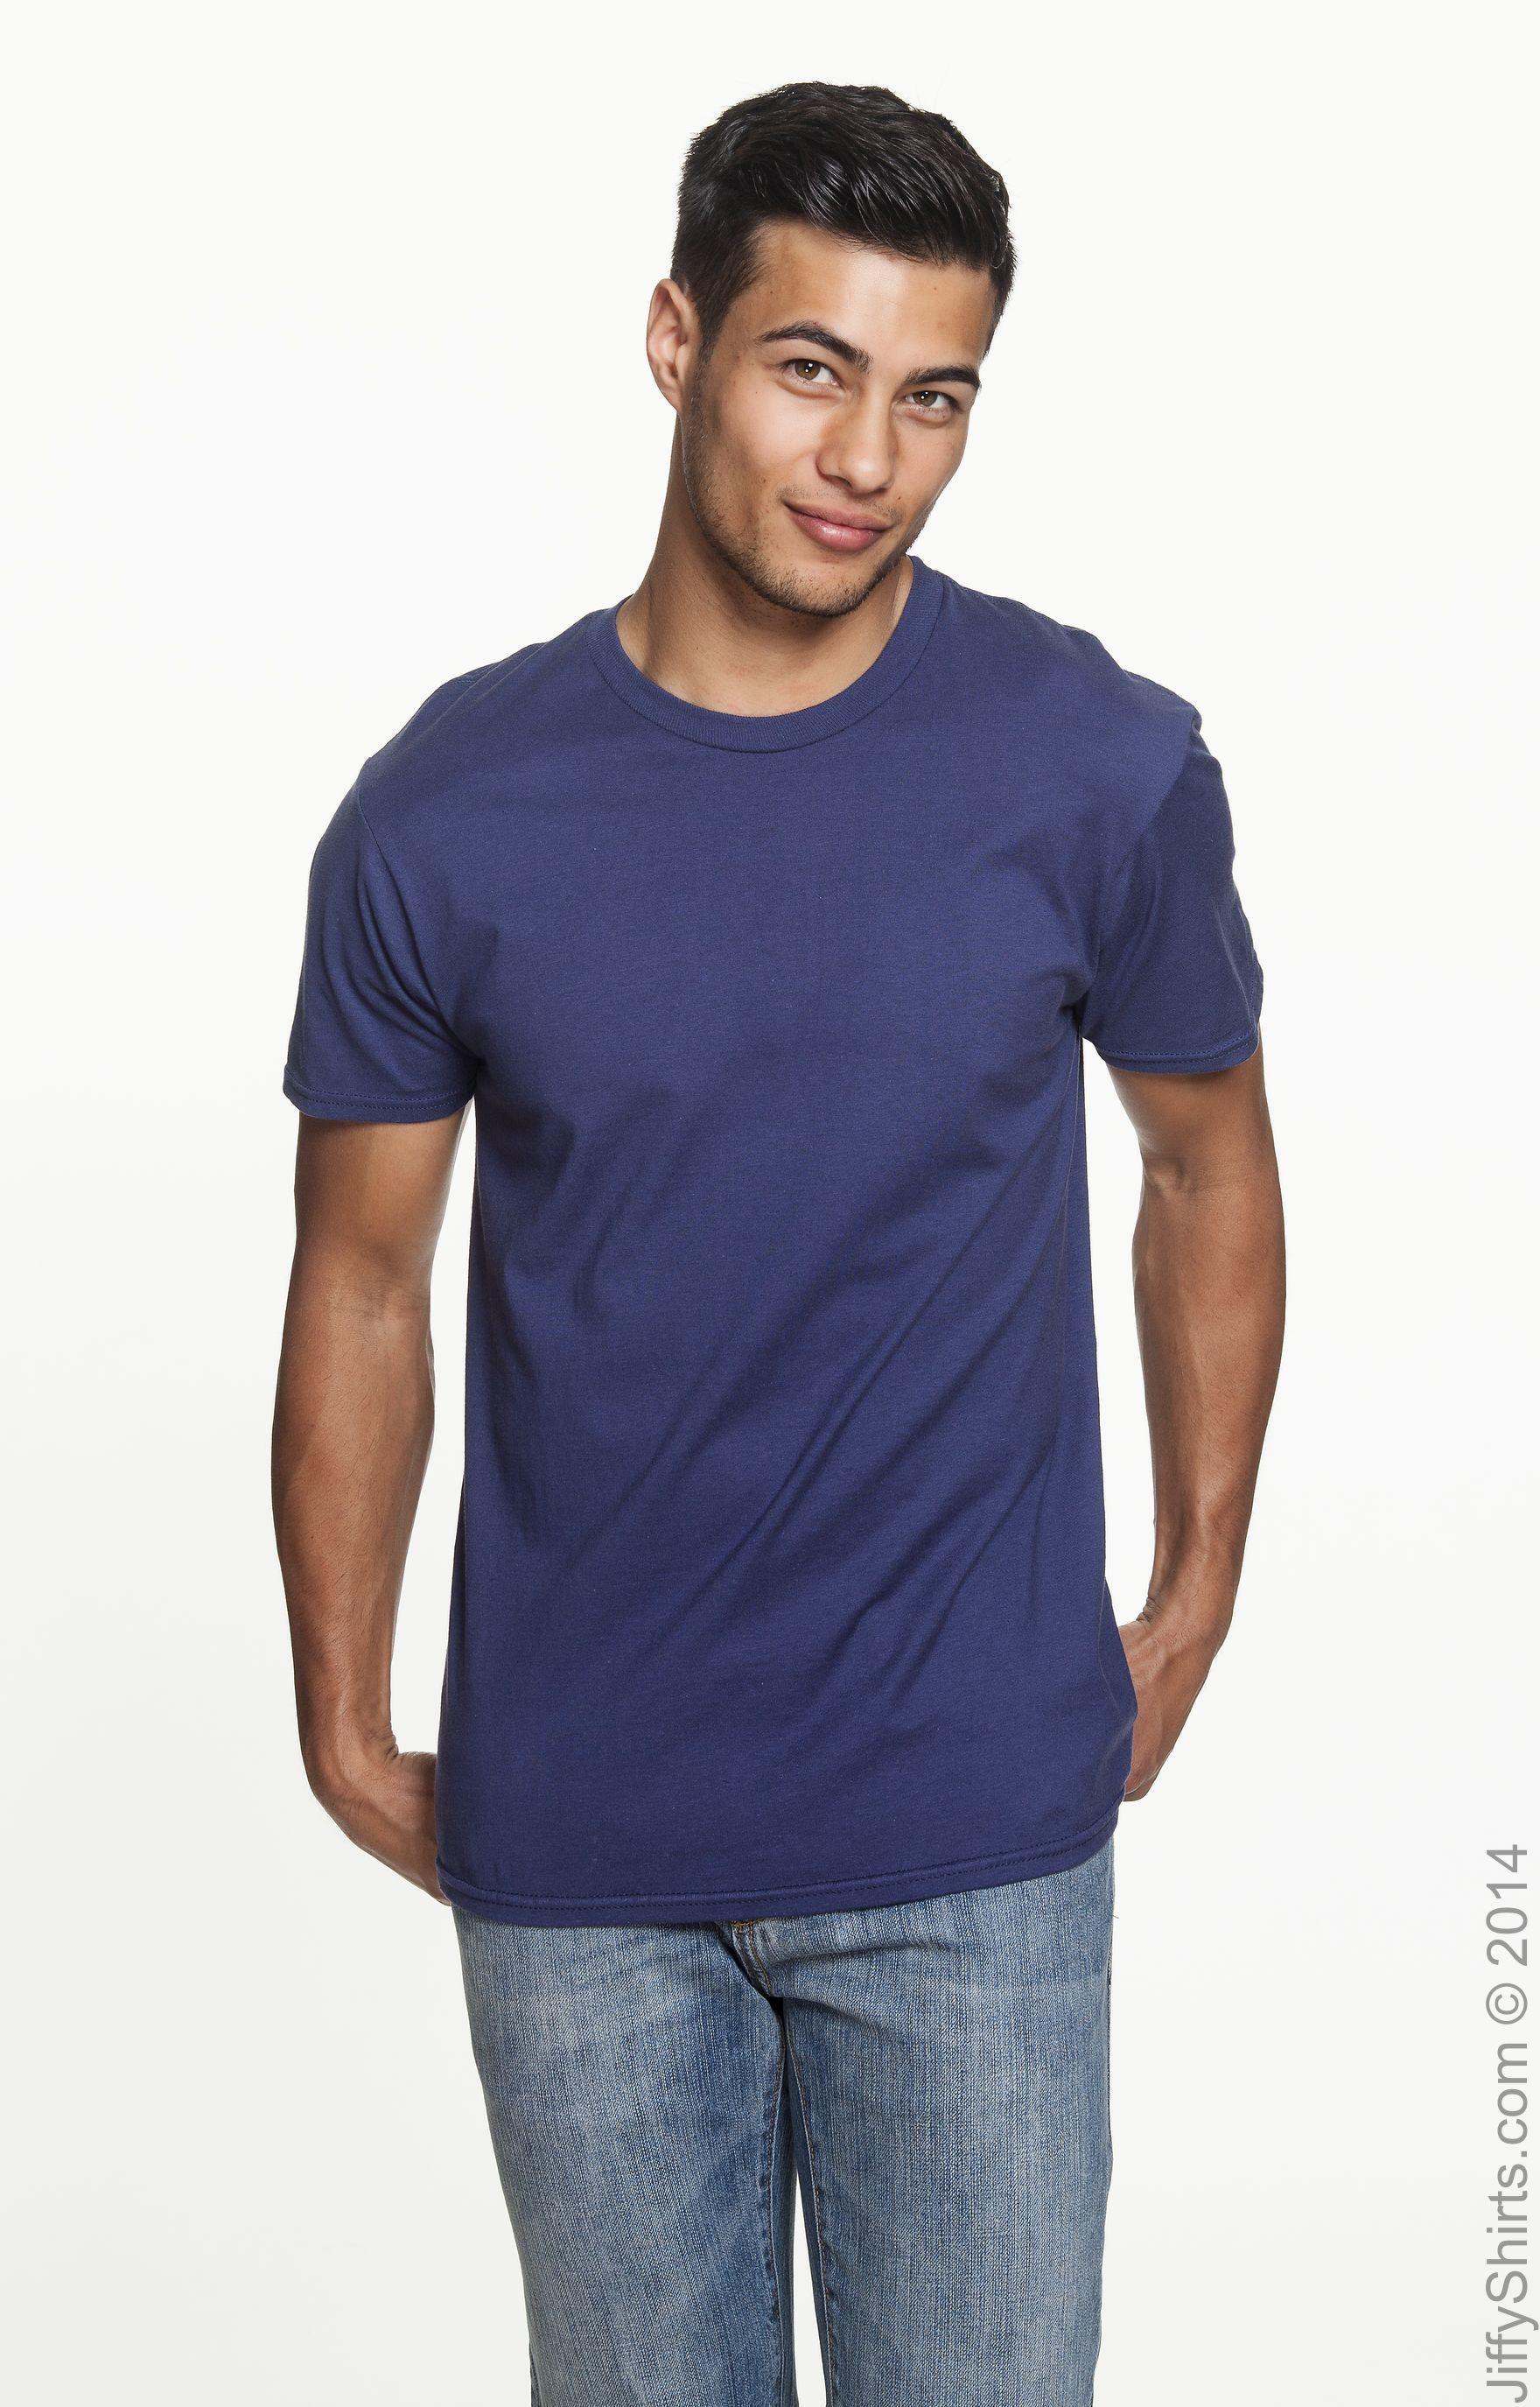 HE-MAN Retro style premium quality t shirt 100/% cotton